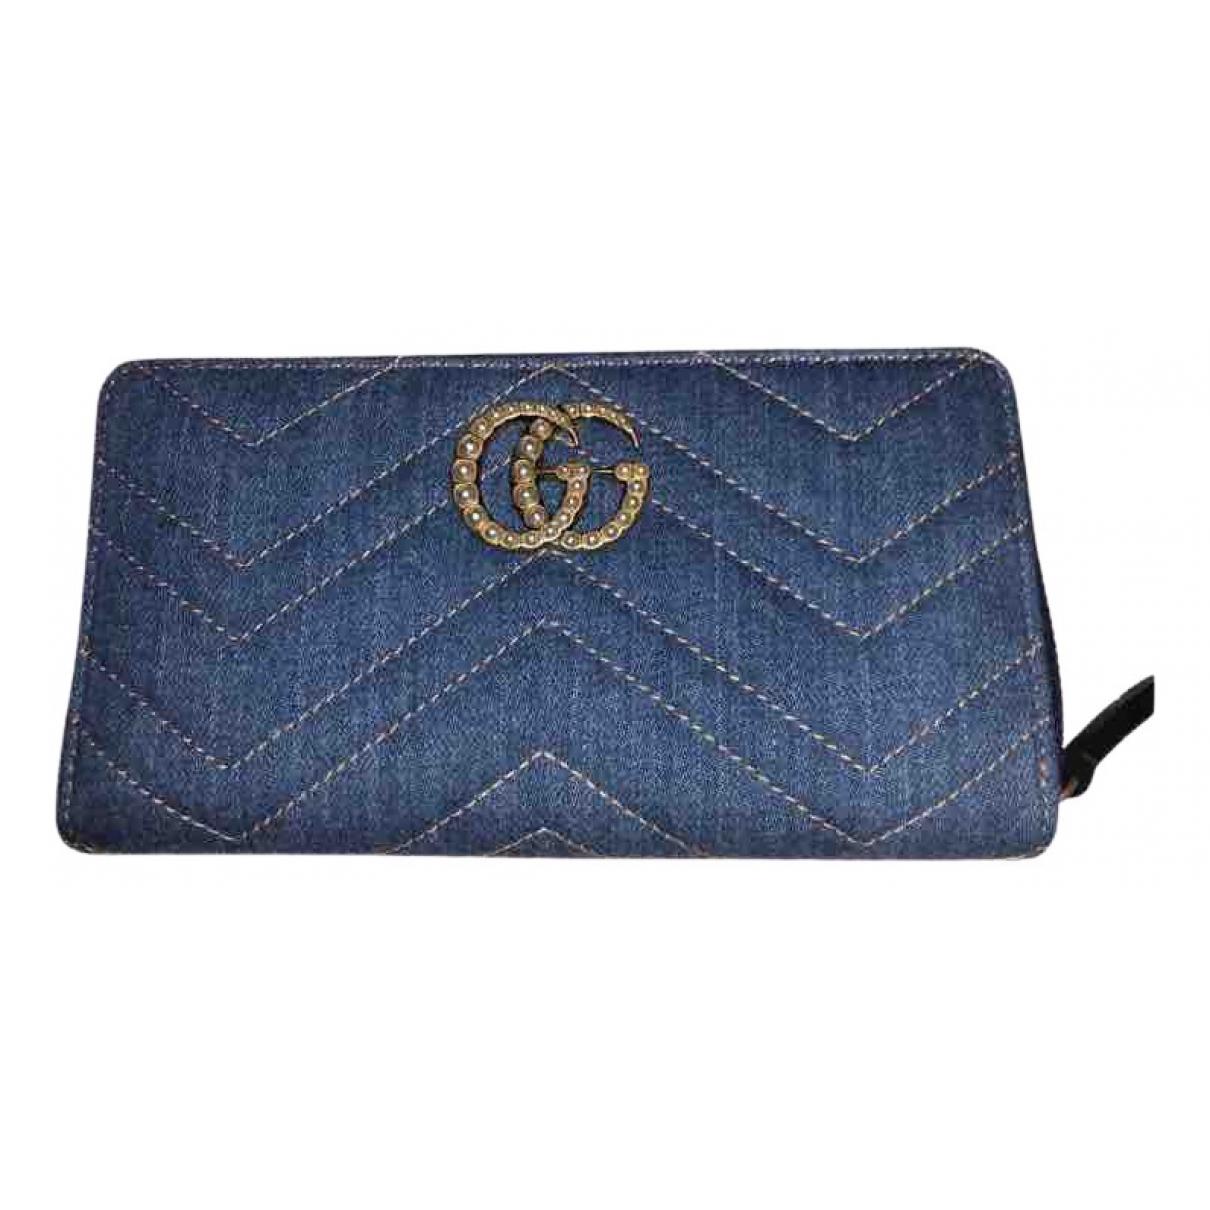 Gucci Marmont Blue Denim - Jeans wallet for Women \N